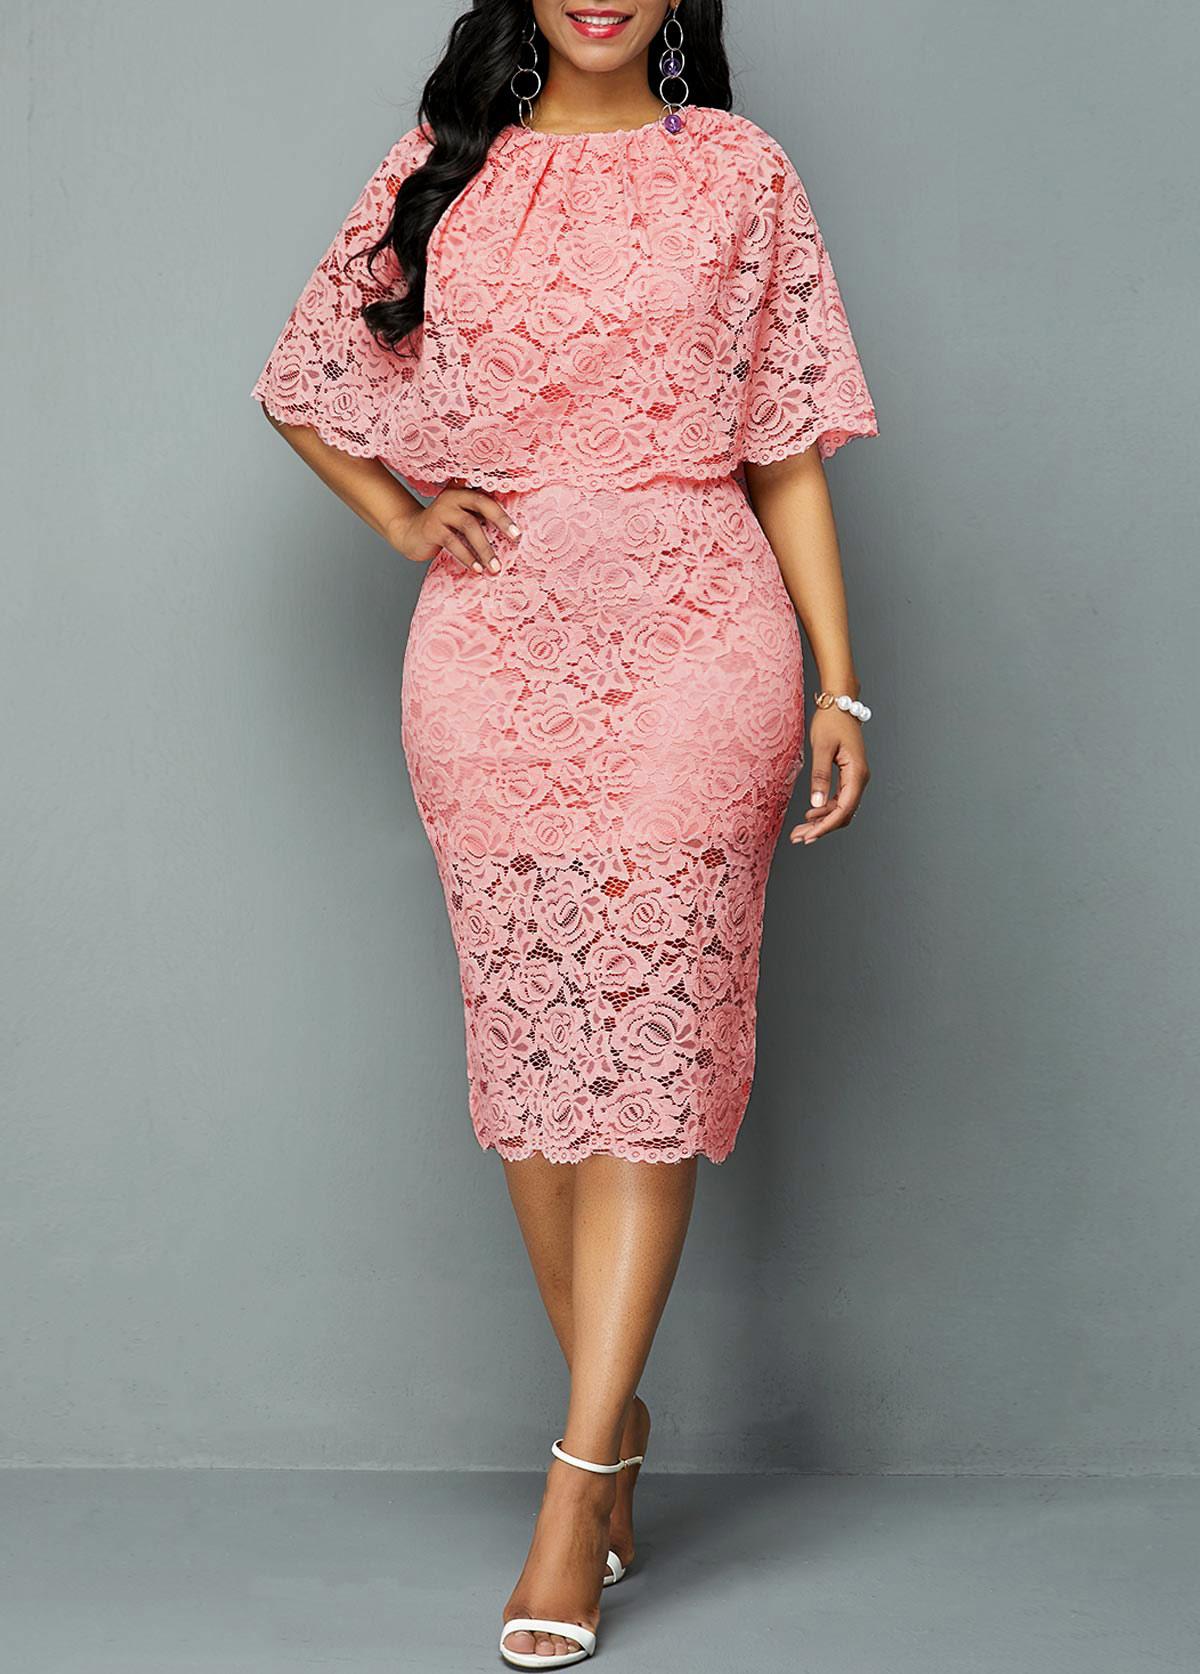 ROTITA Half Sleeve Overlay Embellished Lace Dress